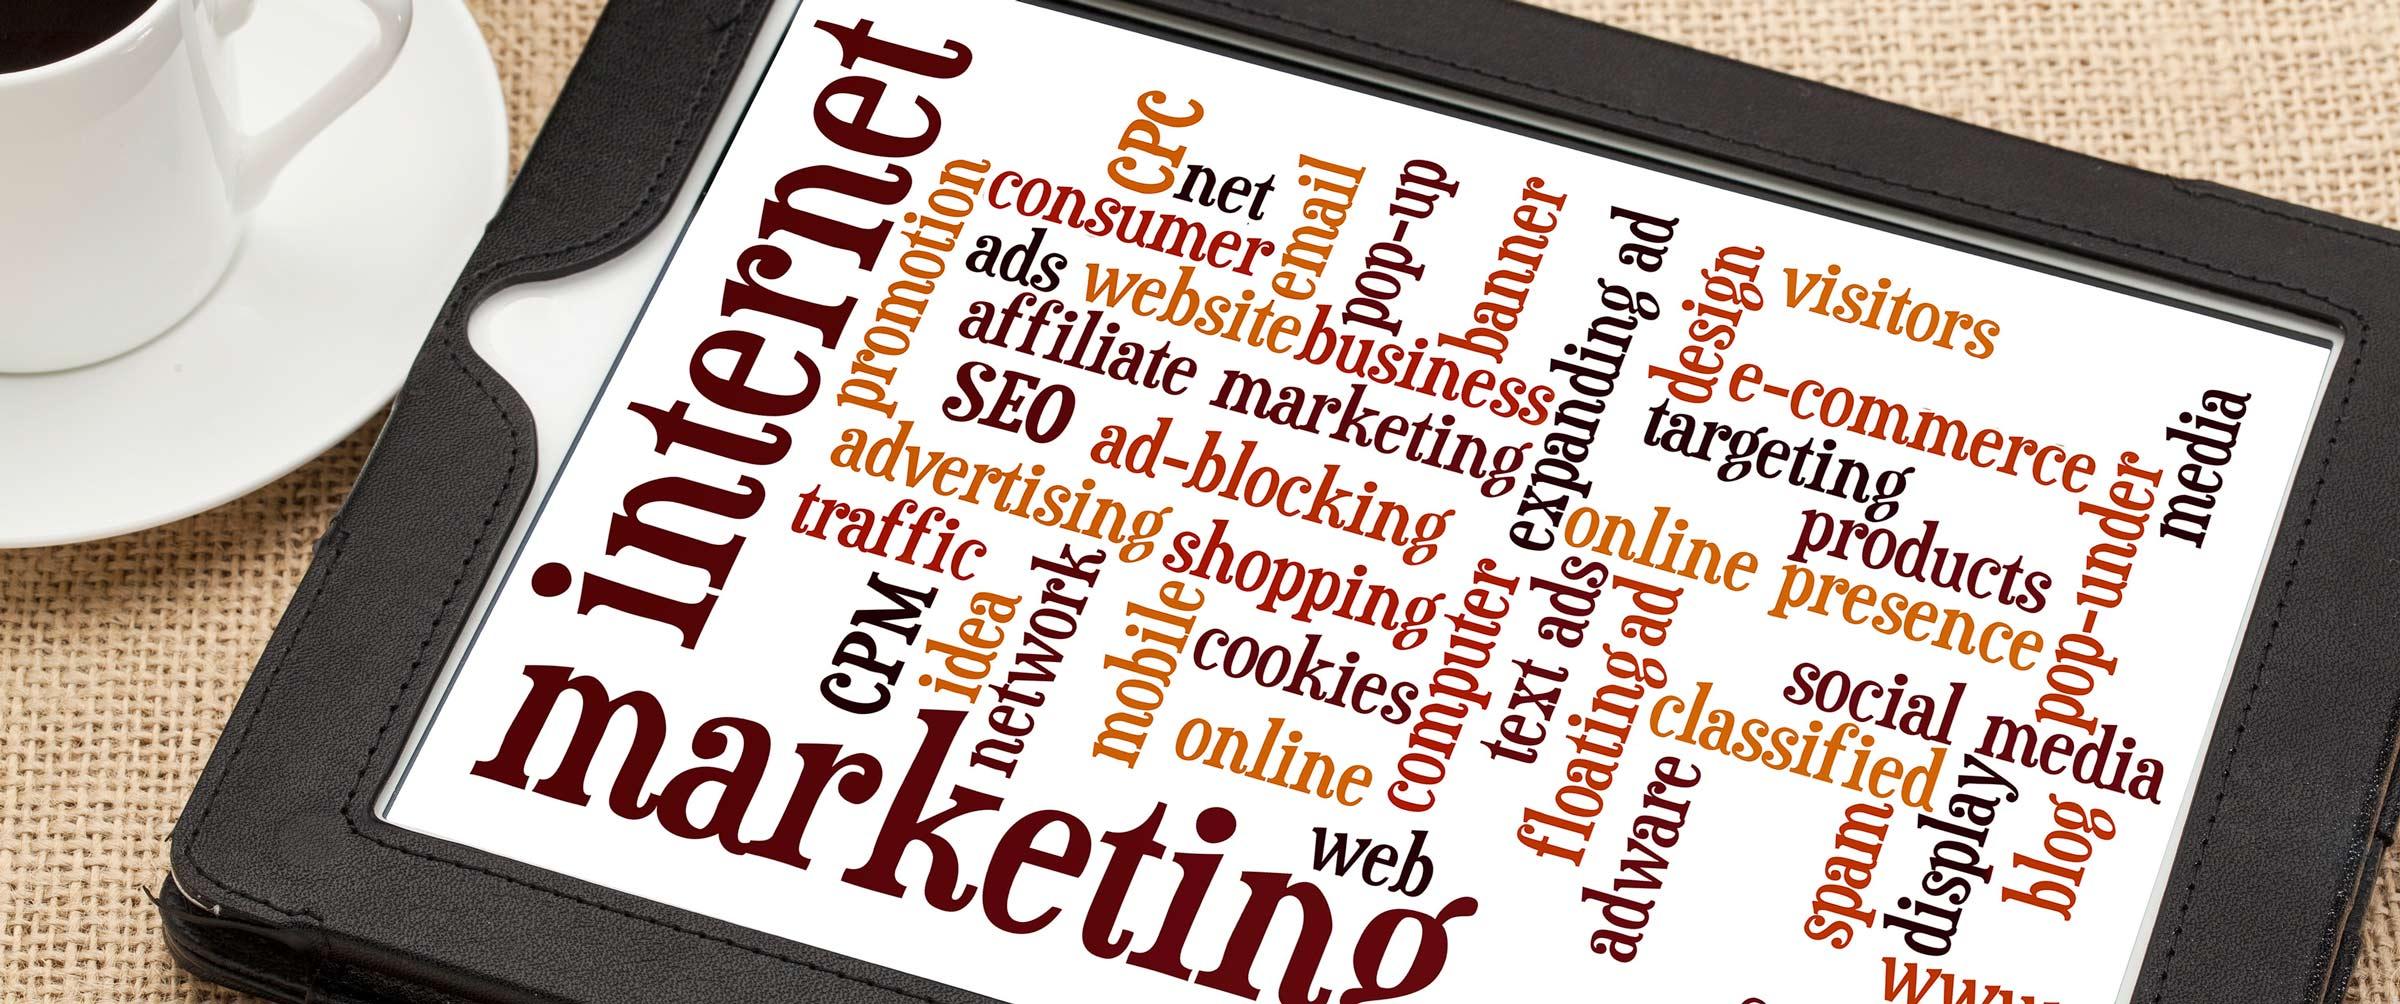 Internet Marketing Wordcloud